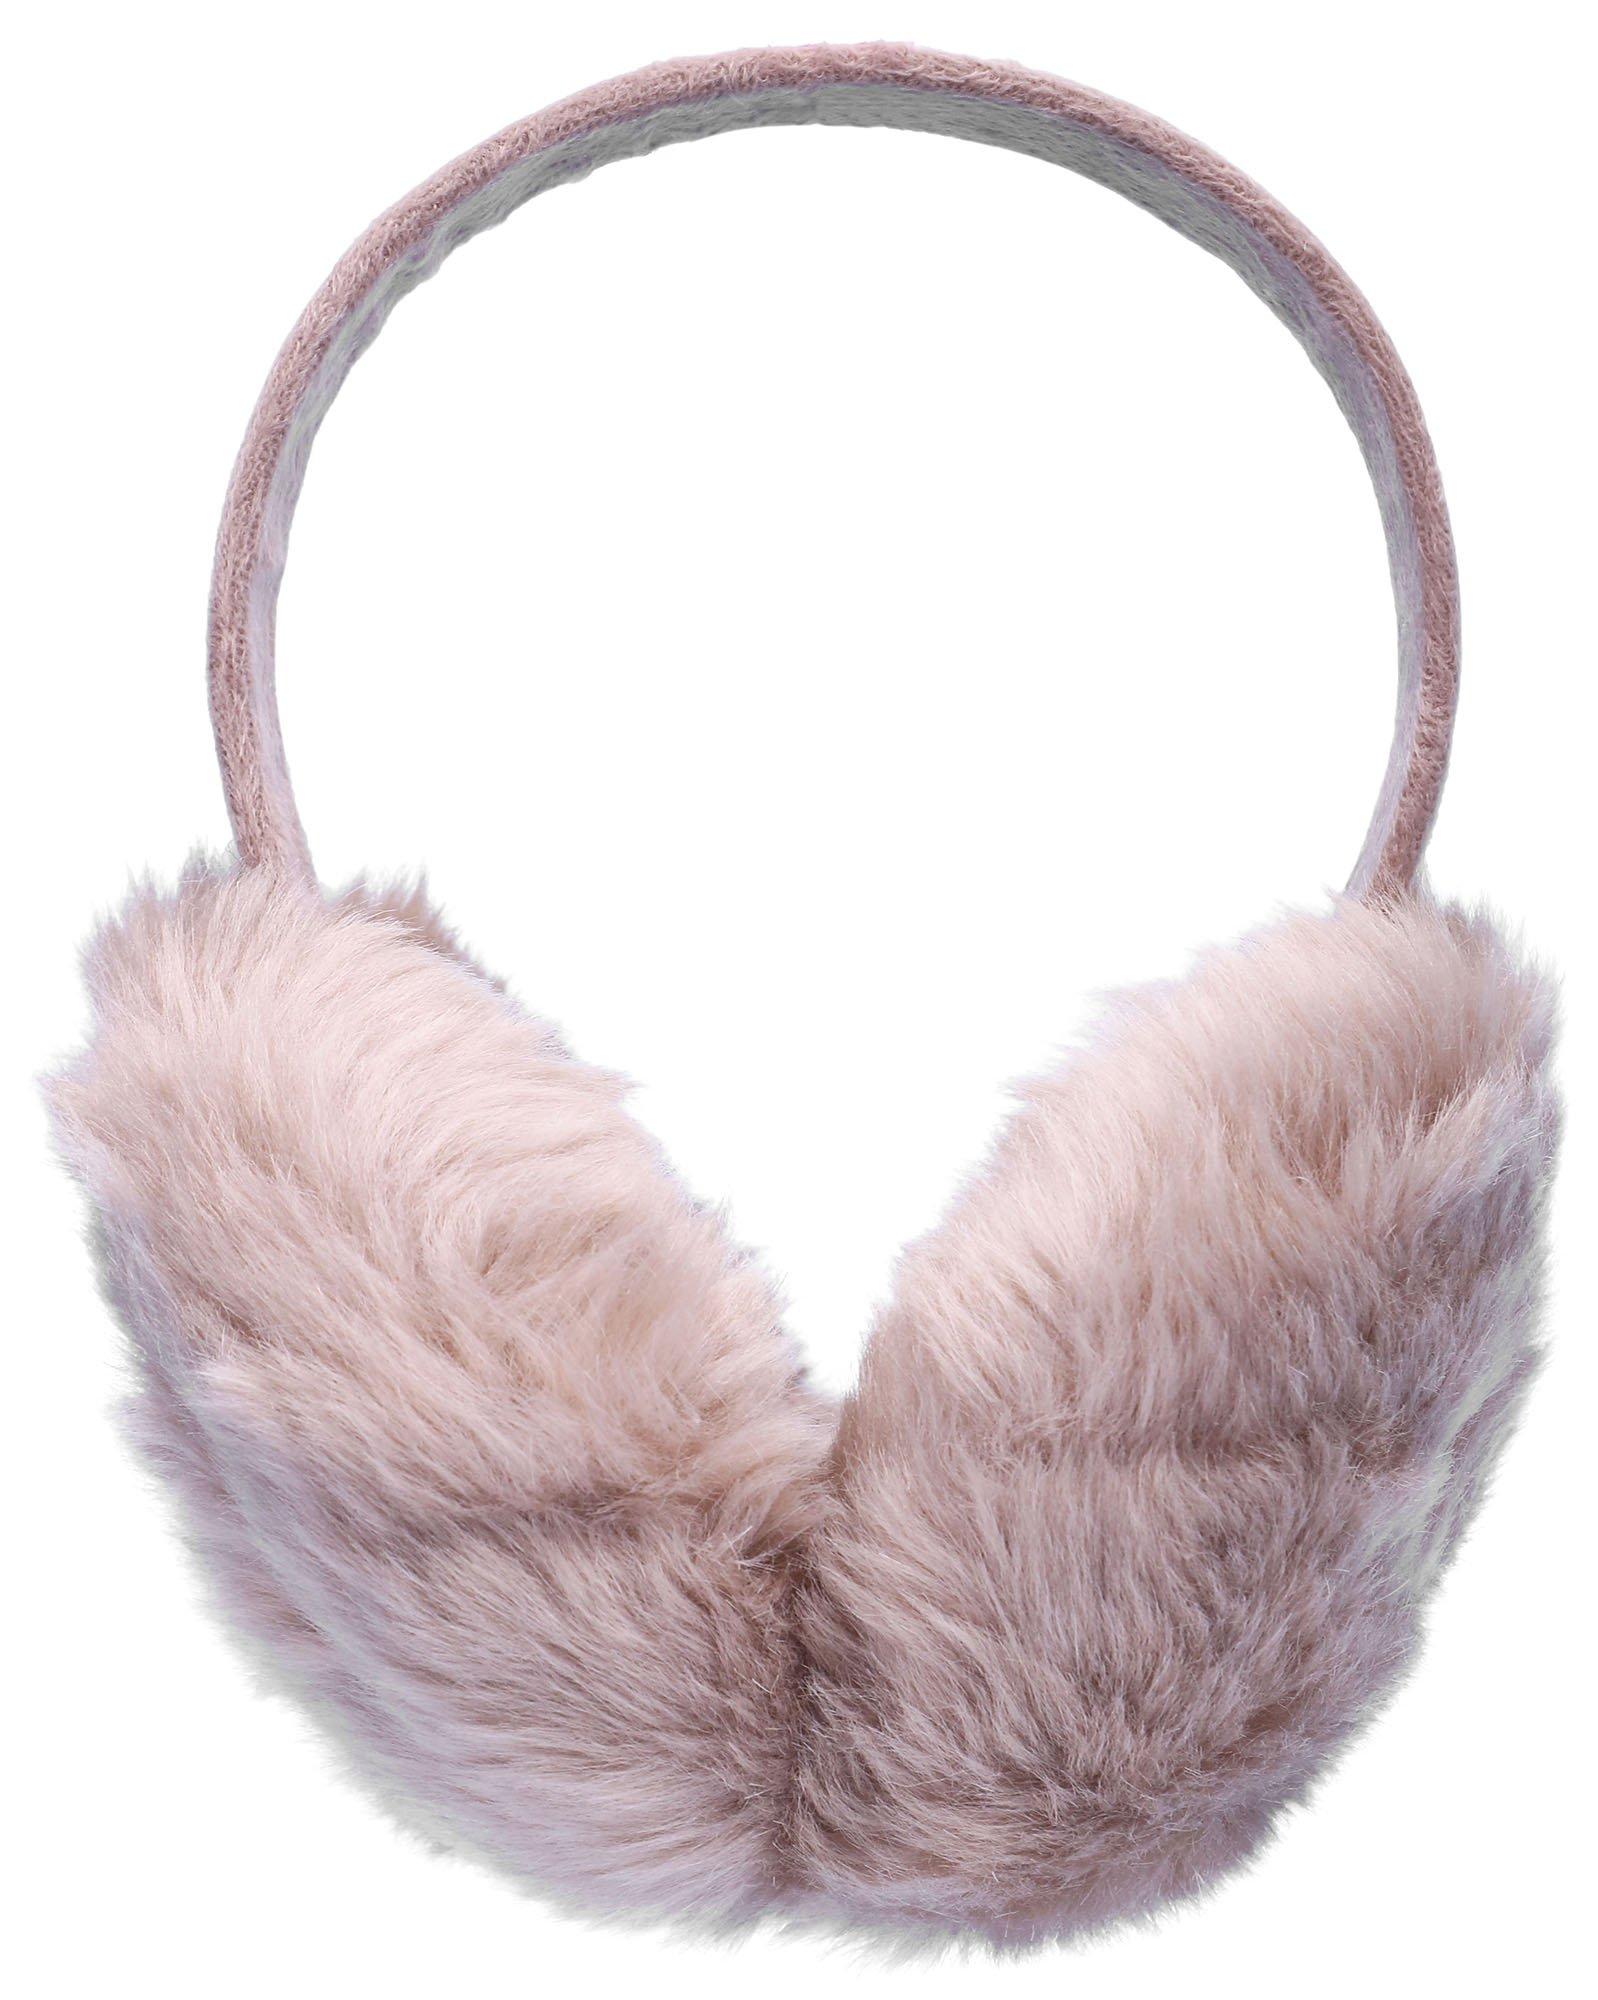 Simplicity Women Men Insulated Furry Plush Ear Muffs Winter Earmuffs, Khaki